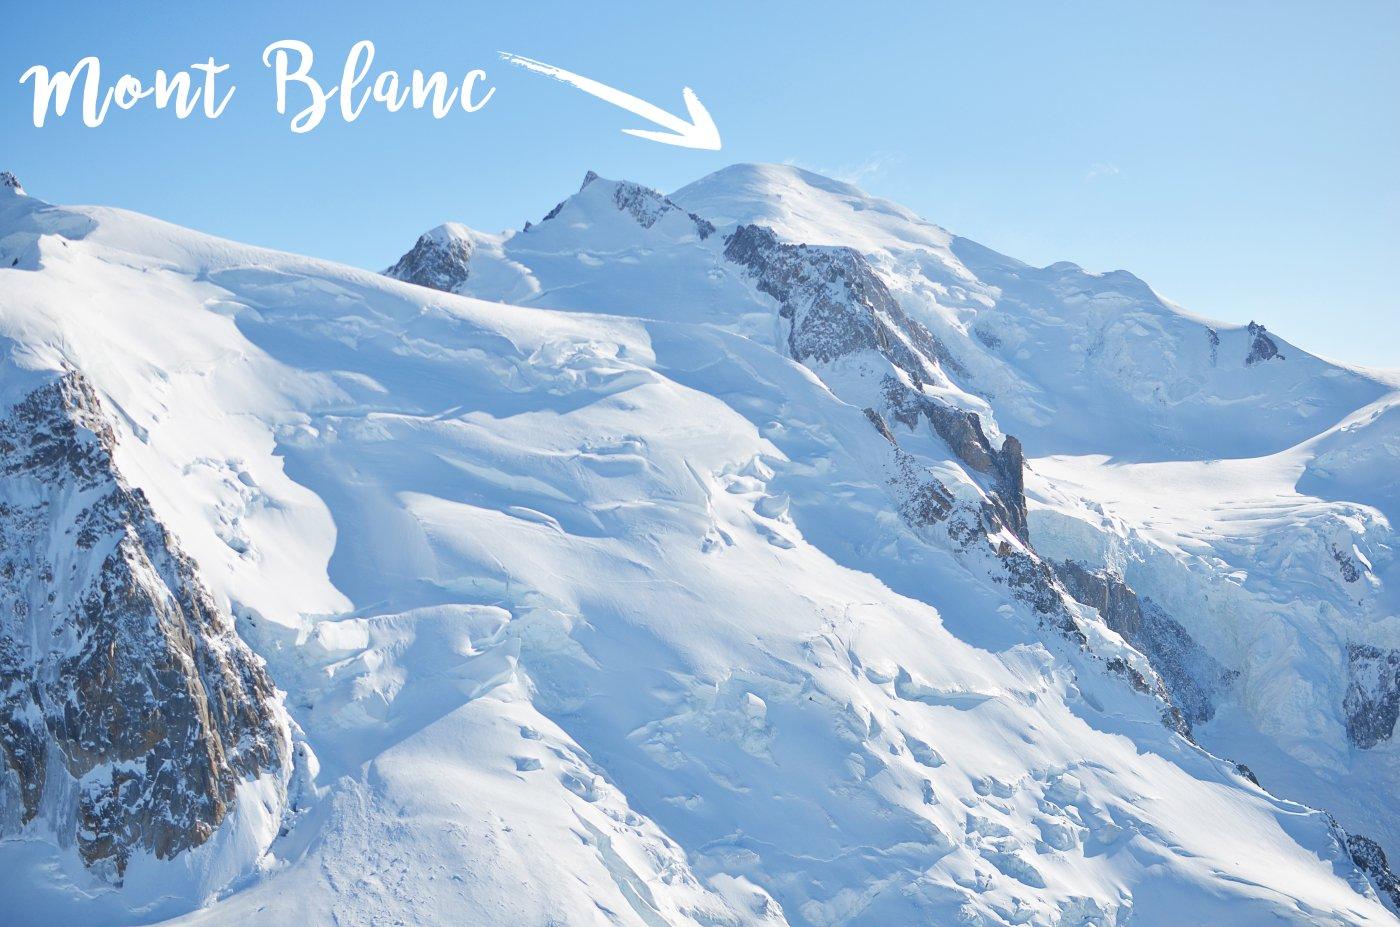 Chamonix Mont Blanc - widok z Aiguille du Midi